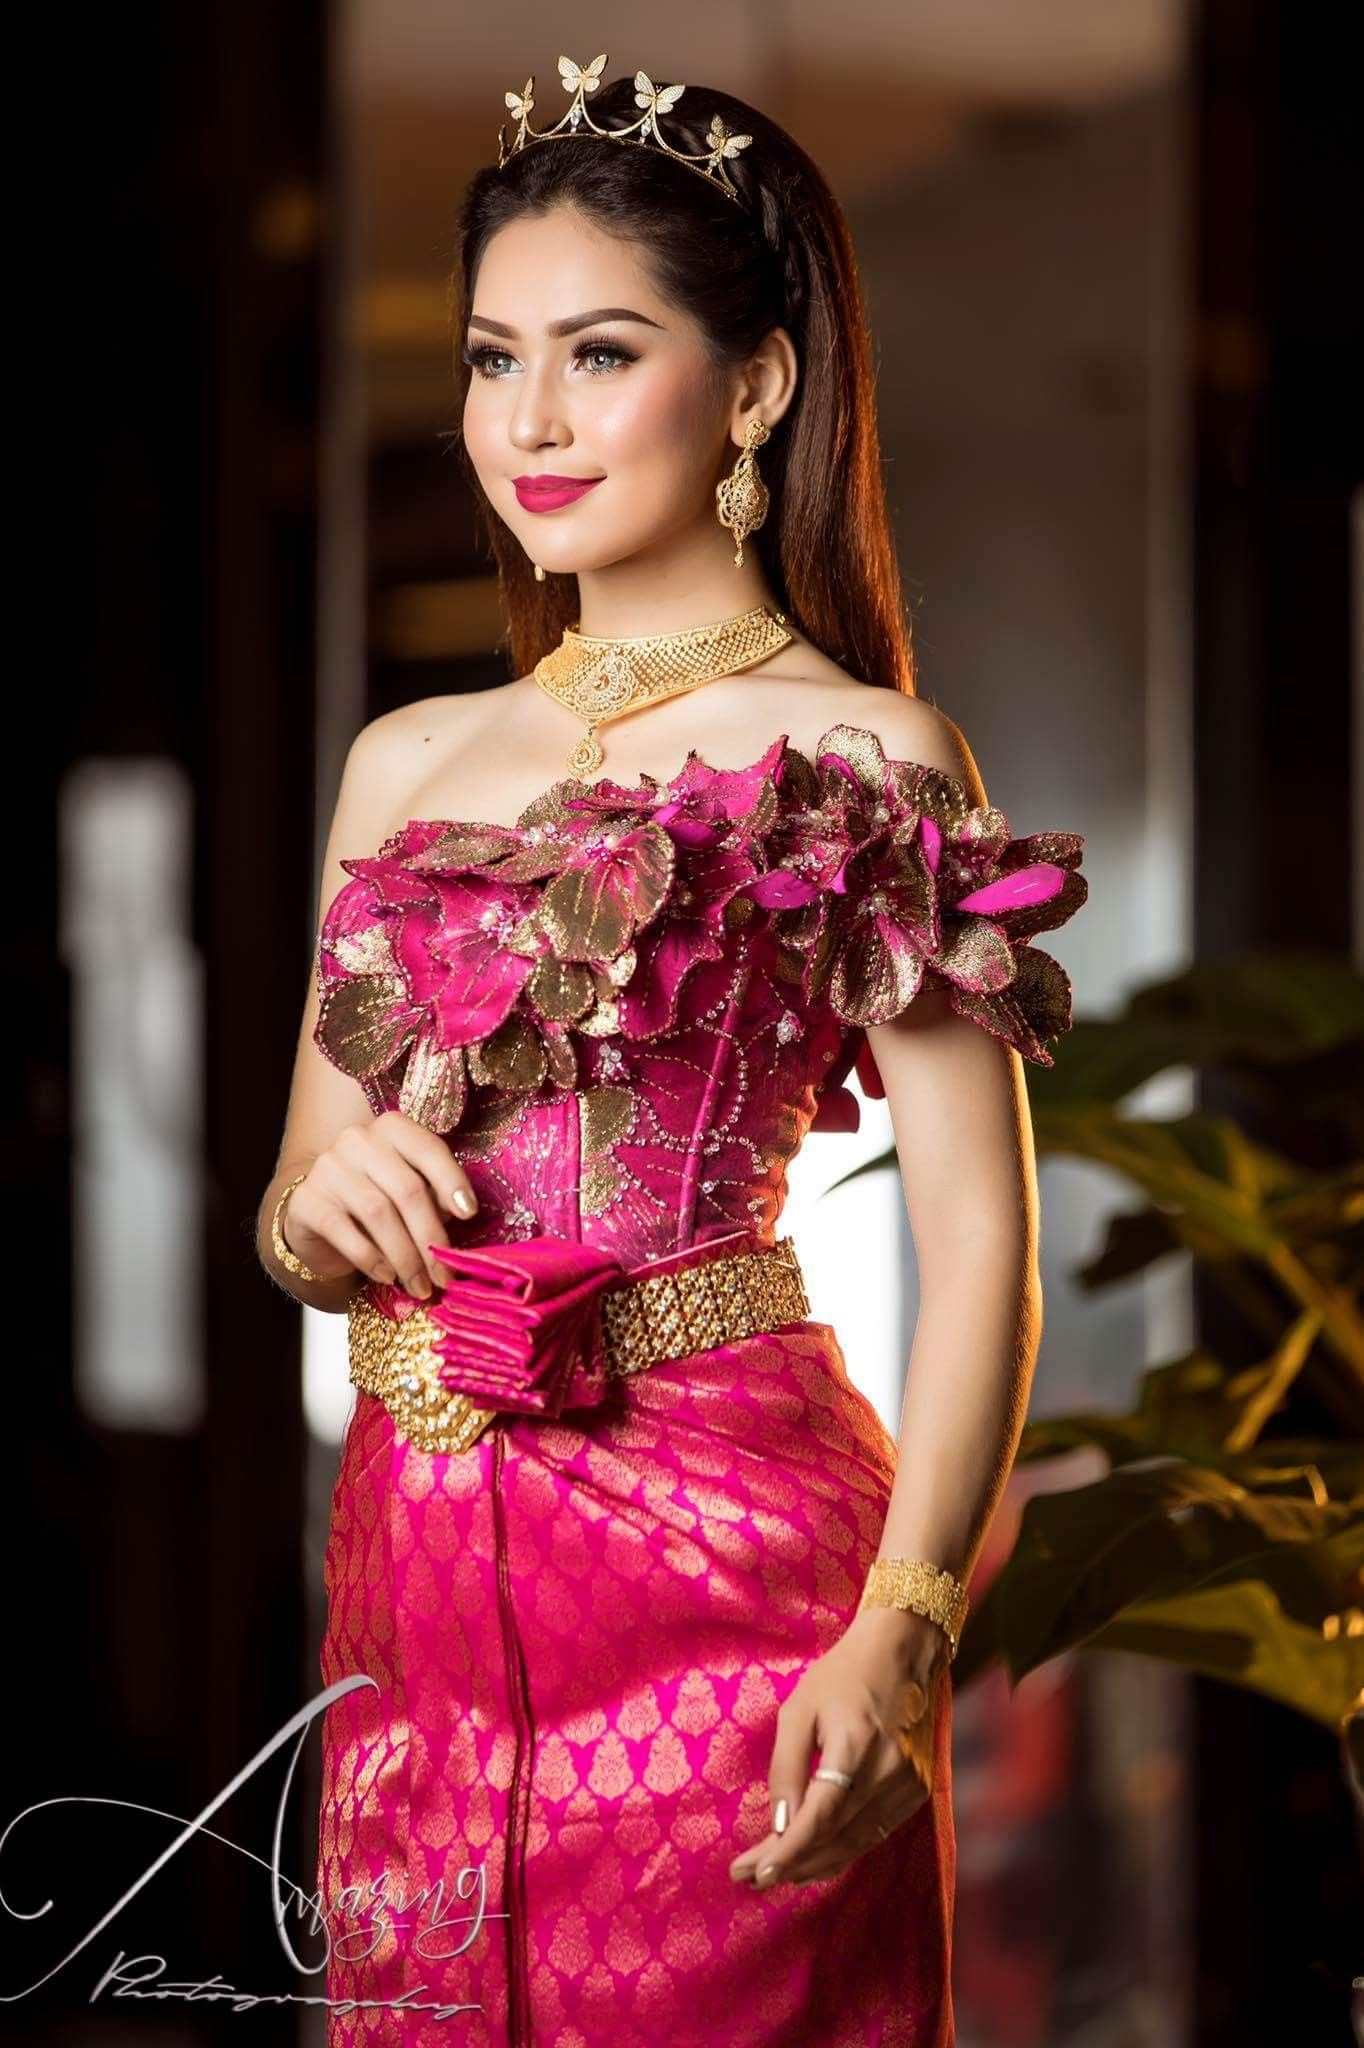 Pin by janice san on southeast asian weddingtradition inspiration